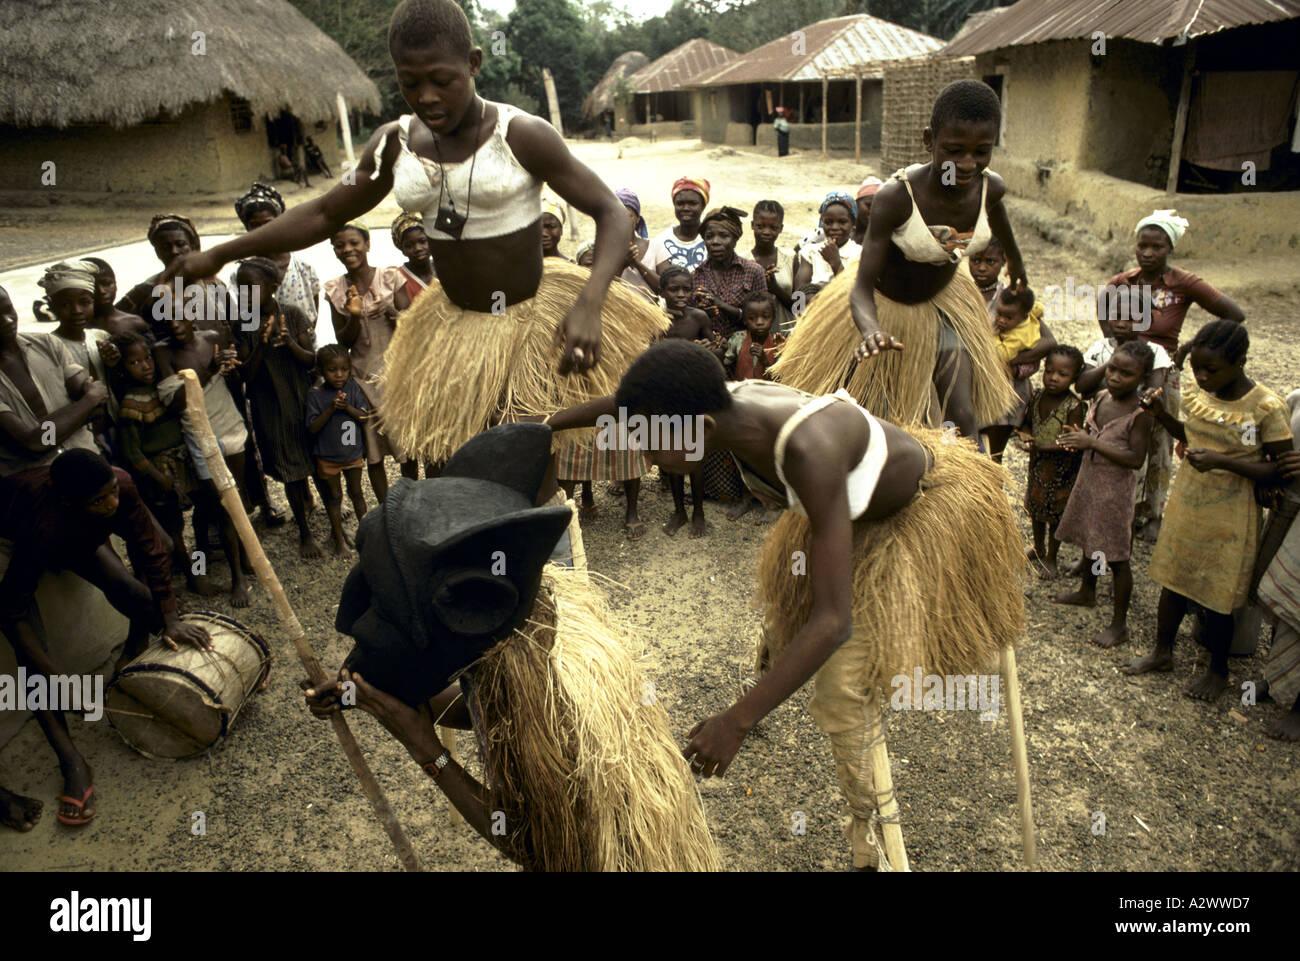 Children wearing grass skirts making traditional dance. Kailahun, Sierra Leone, Africa - Stock Image